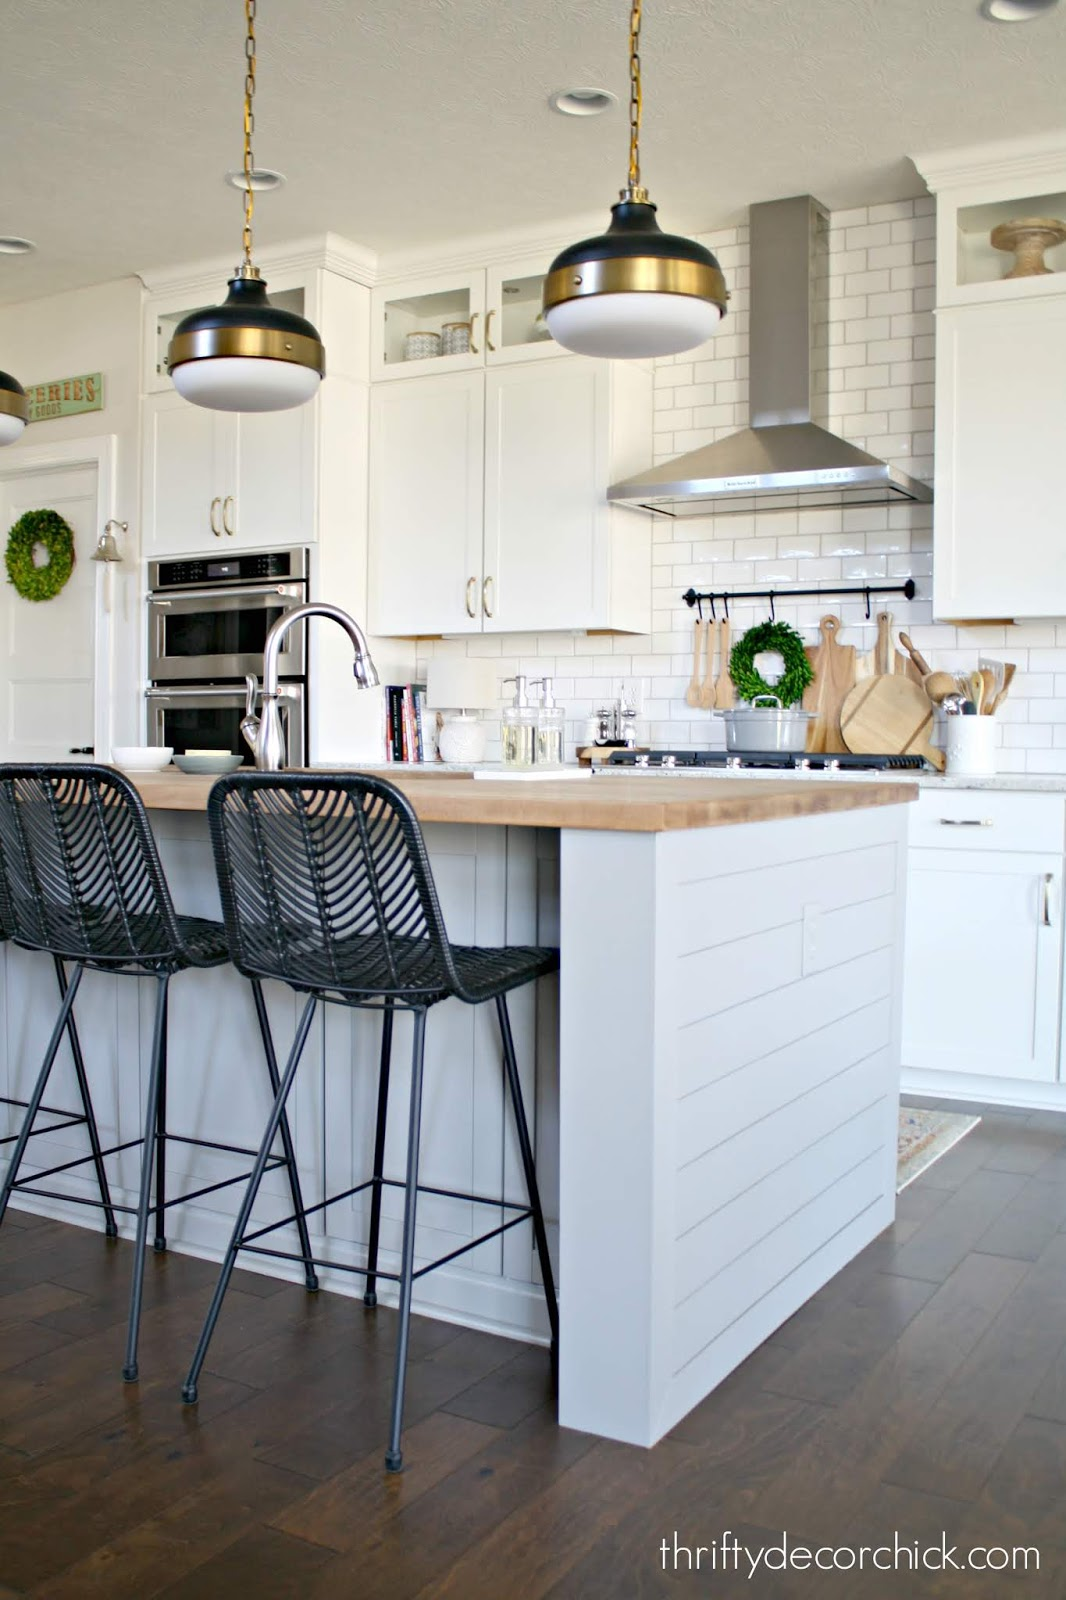 Enclosing overhang on kitchen island